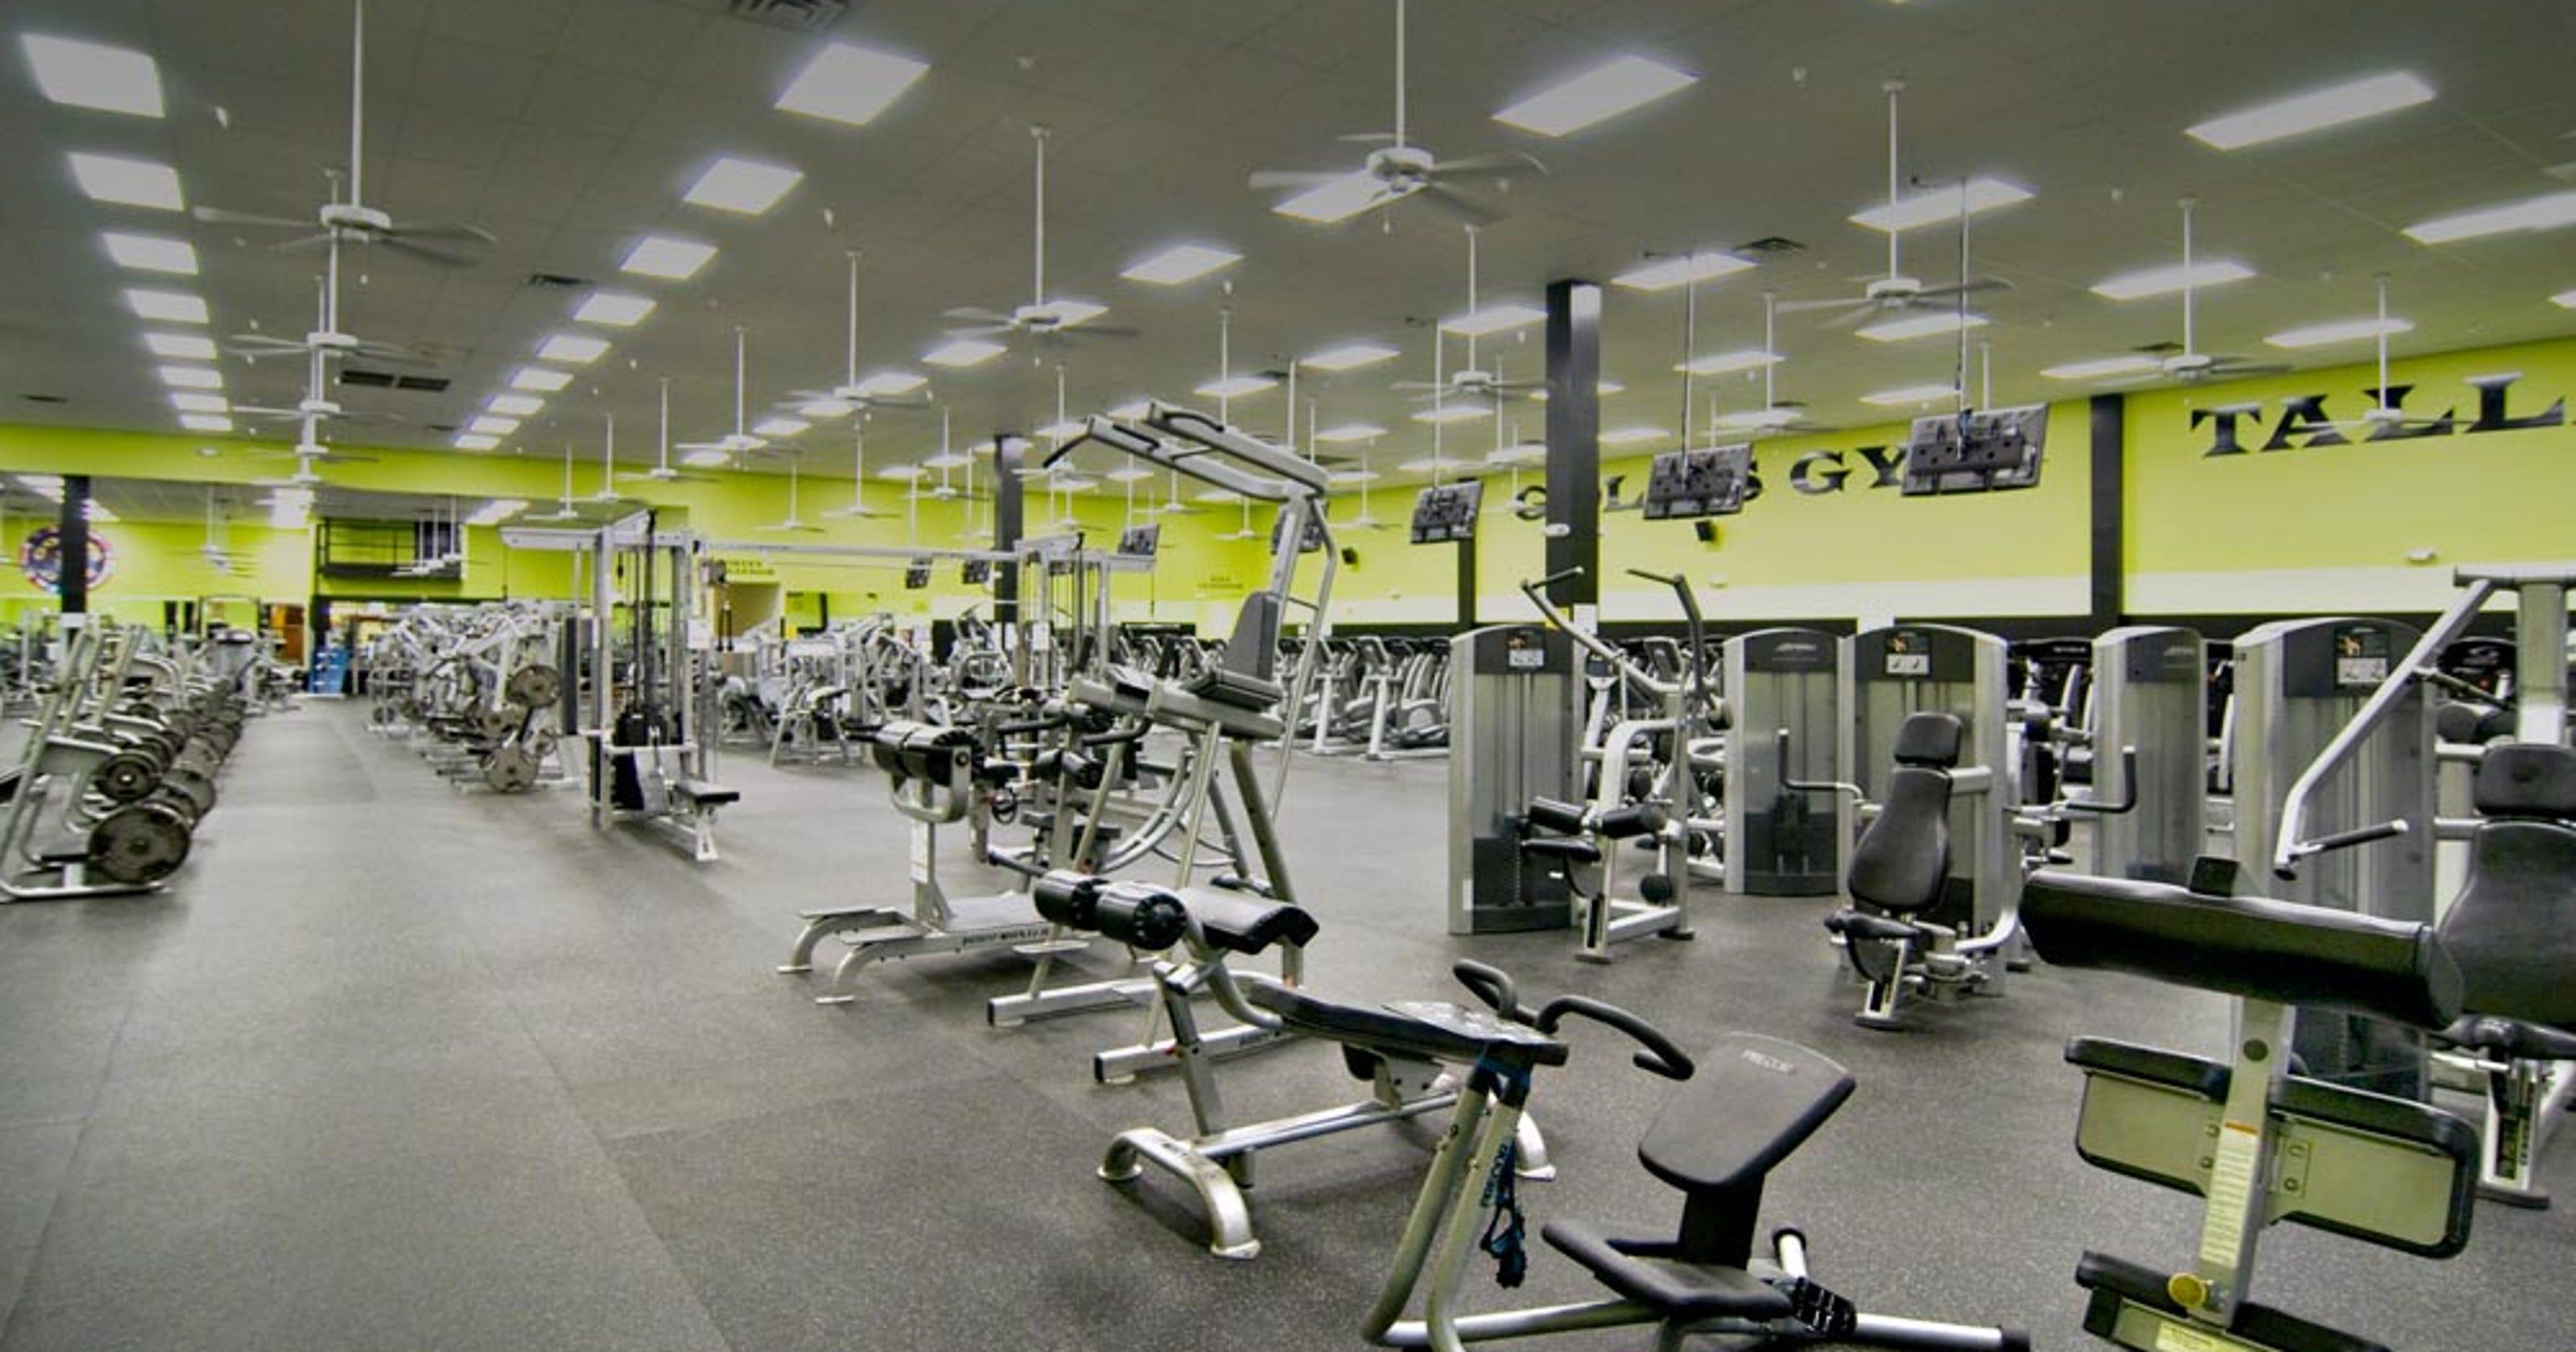 stay profita golds gym - HD1600×800